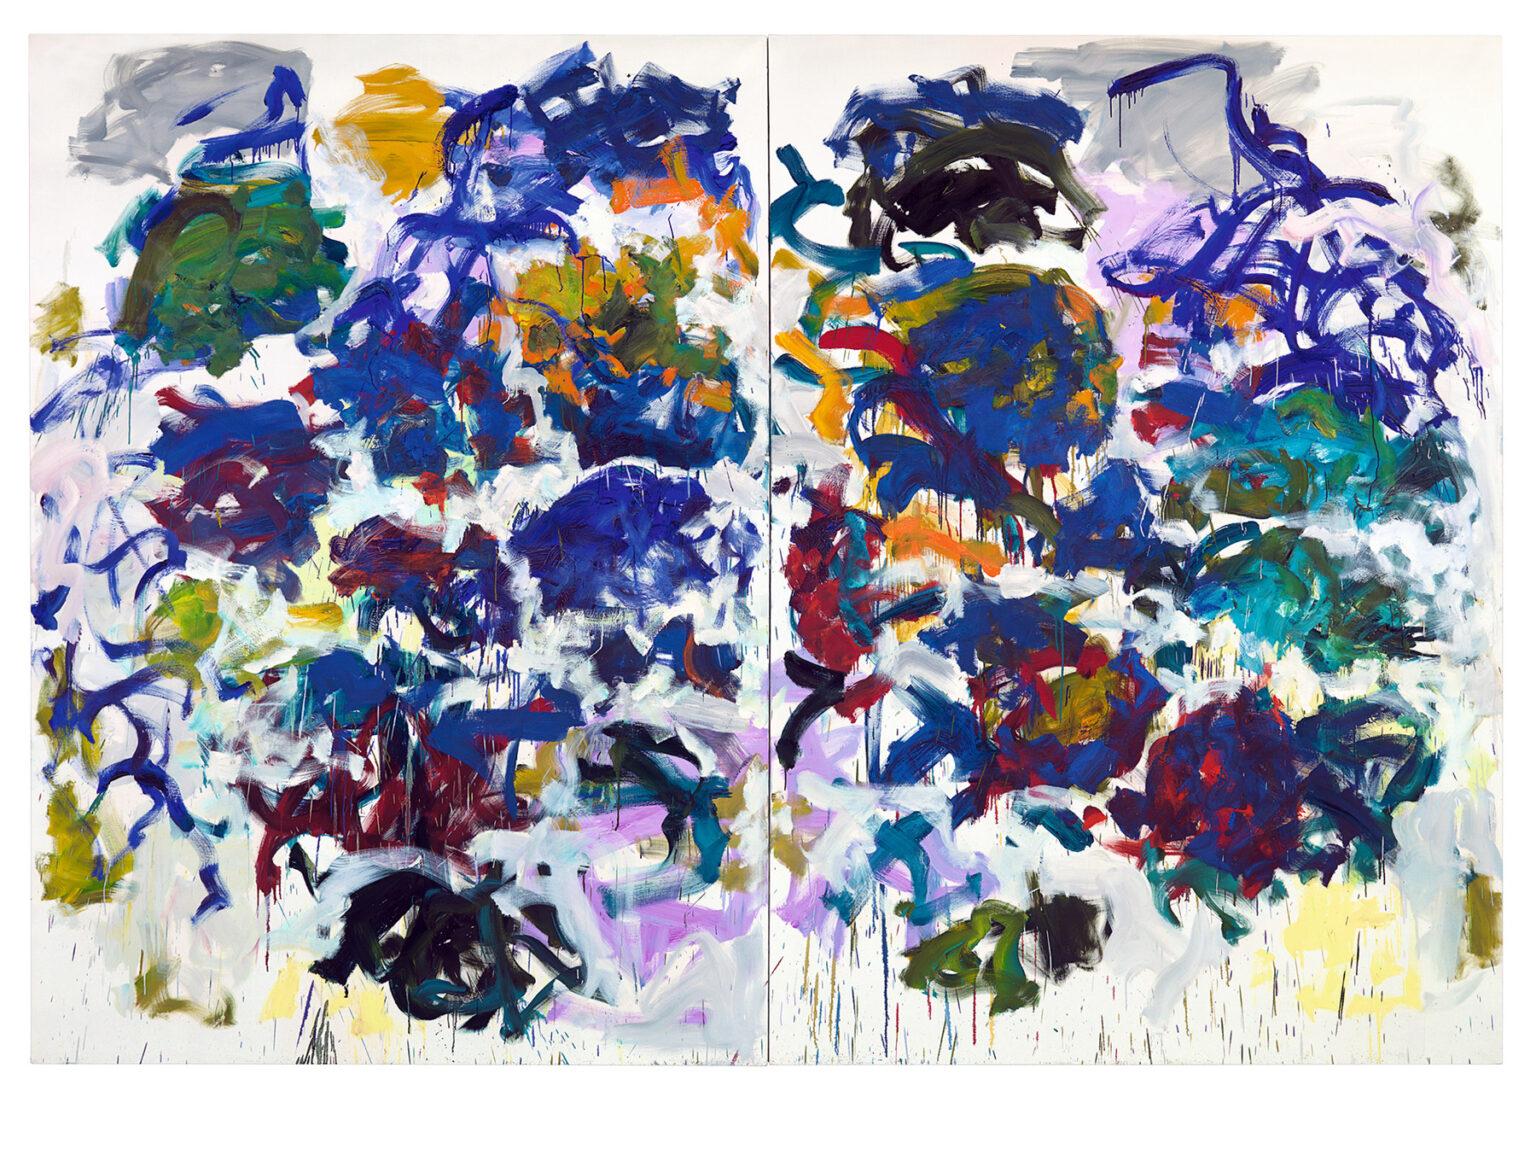 Joan Mitchell. Sunflowers. 1990-1991. Collection of John Cheim. © Estate of Joan Mitchell